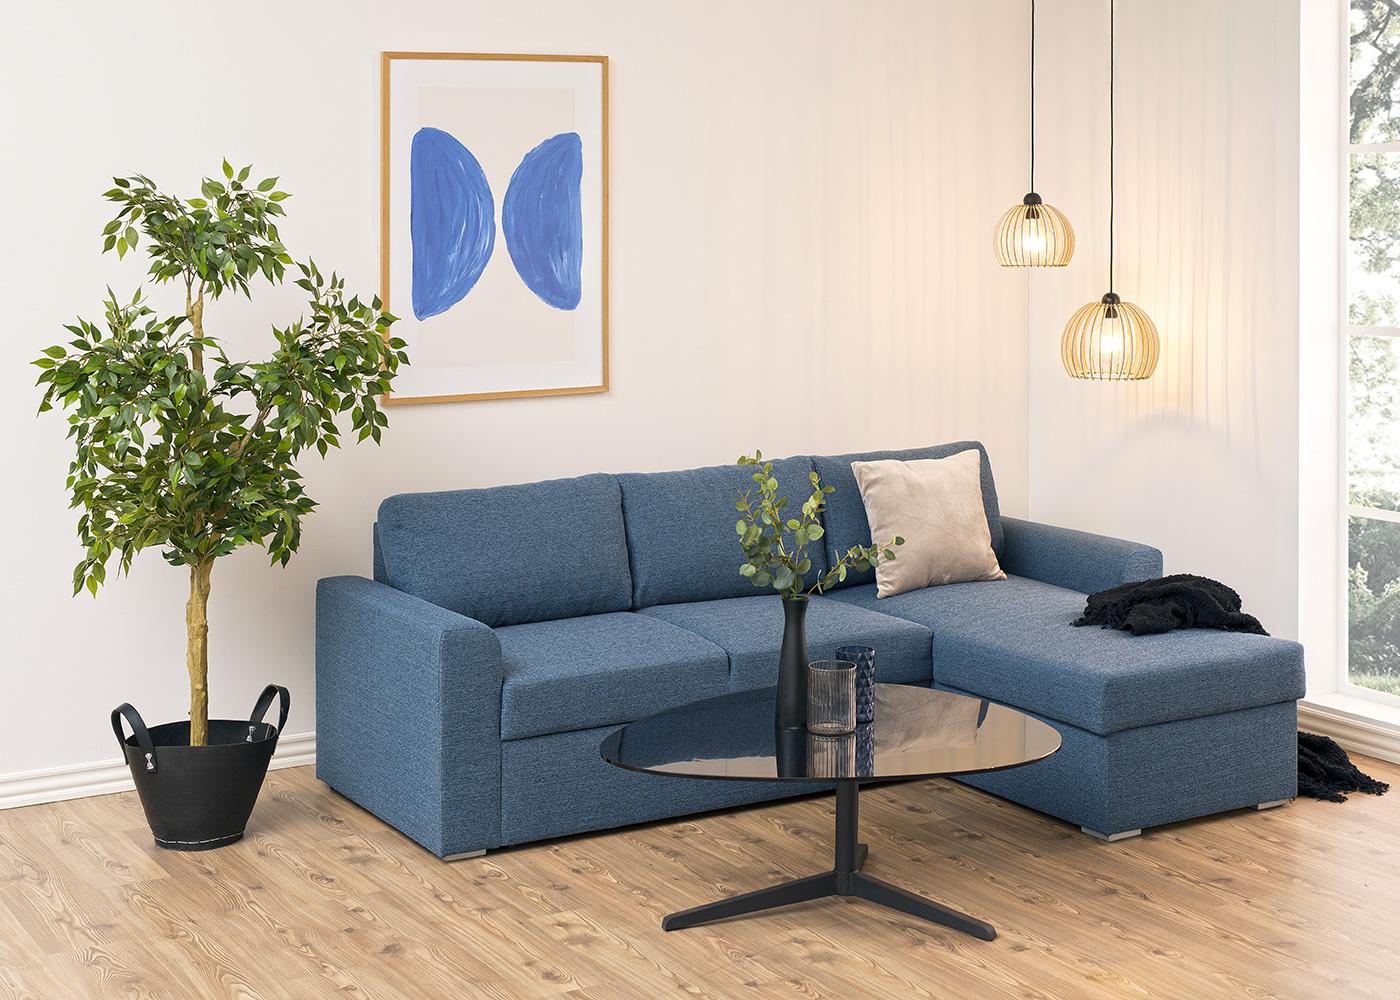 Konferenční stolek Torry, 103 cm, sklo